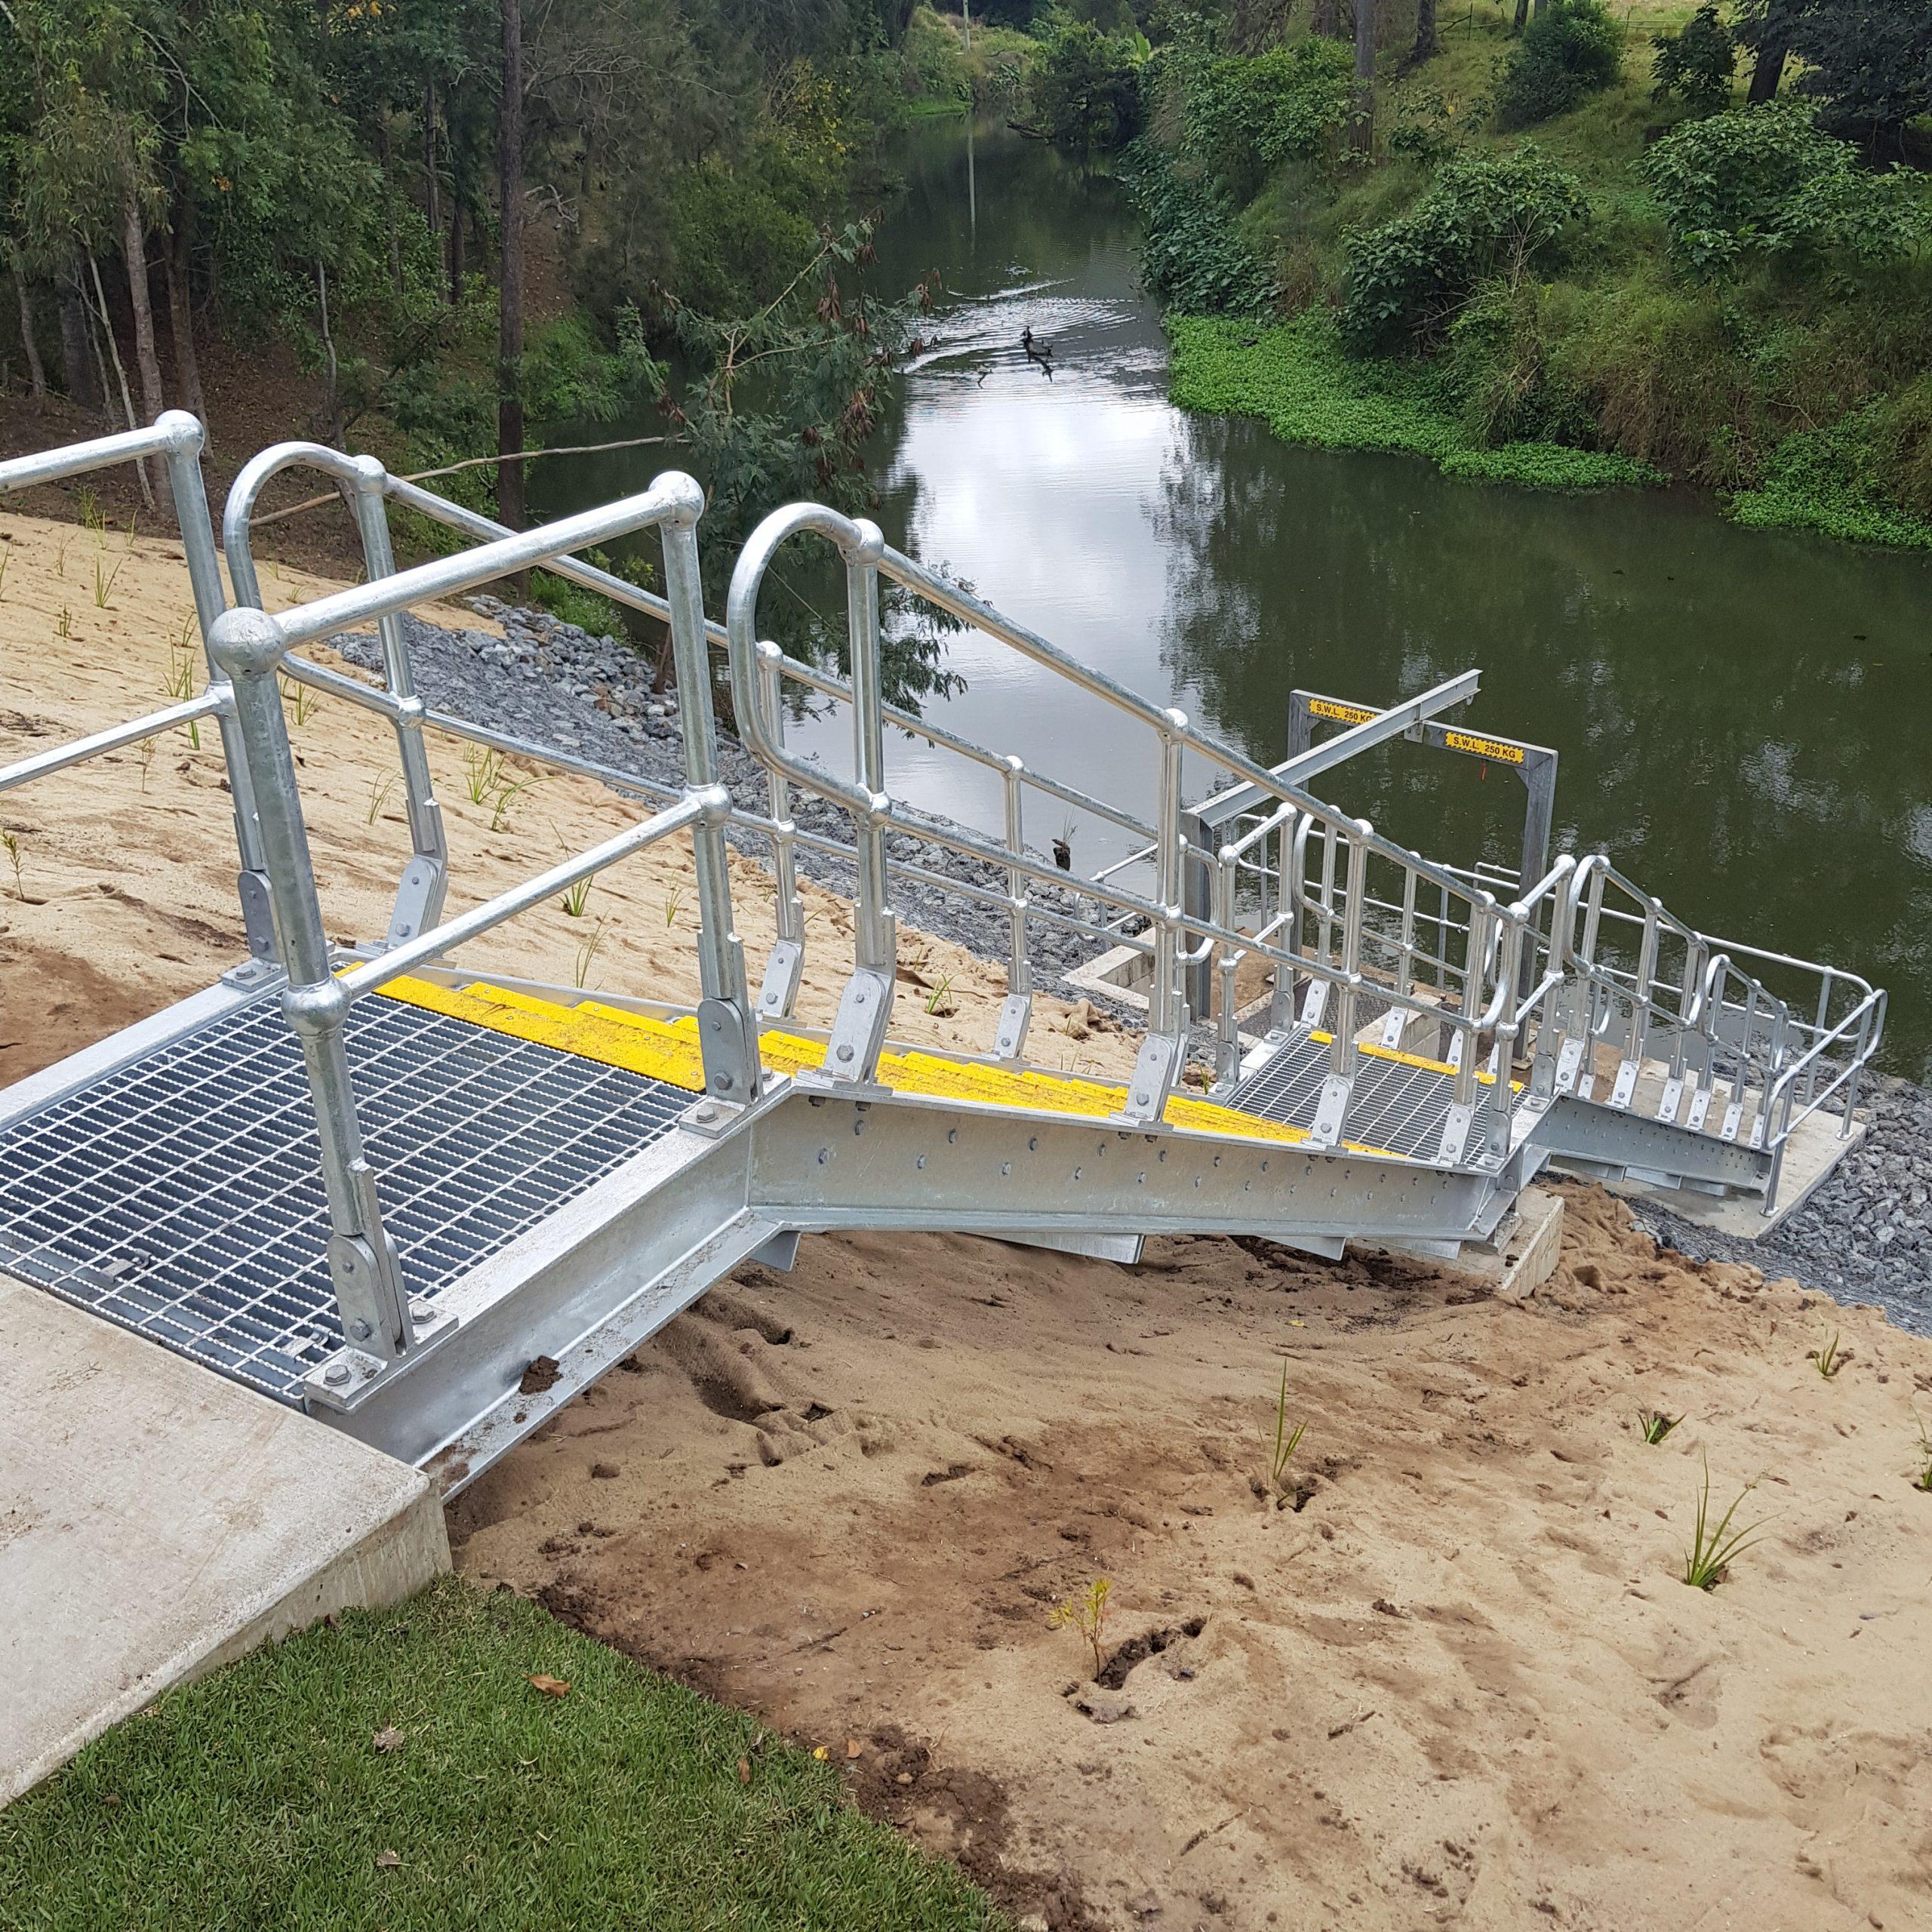 Canungra Raw Water Intake Pump Station